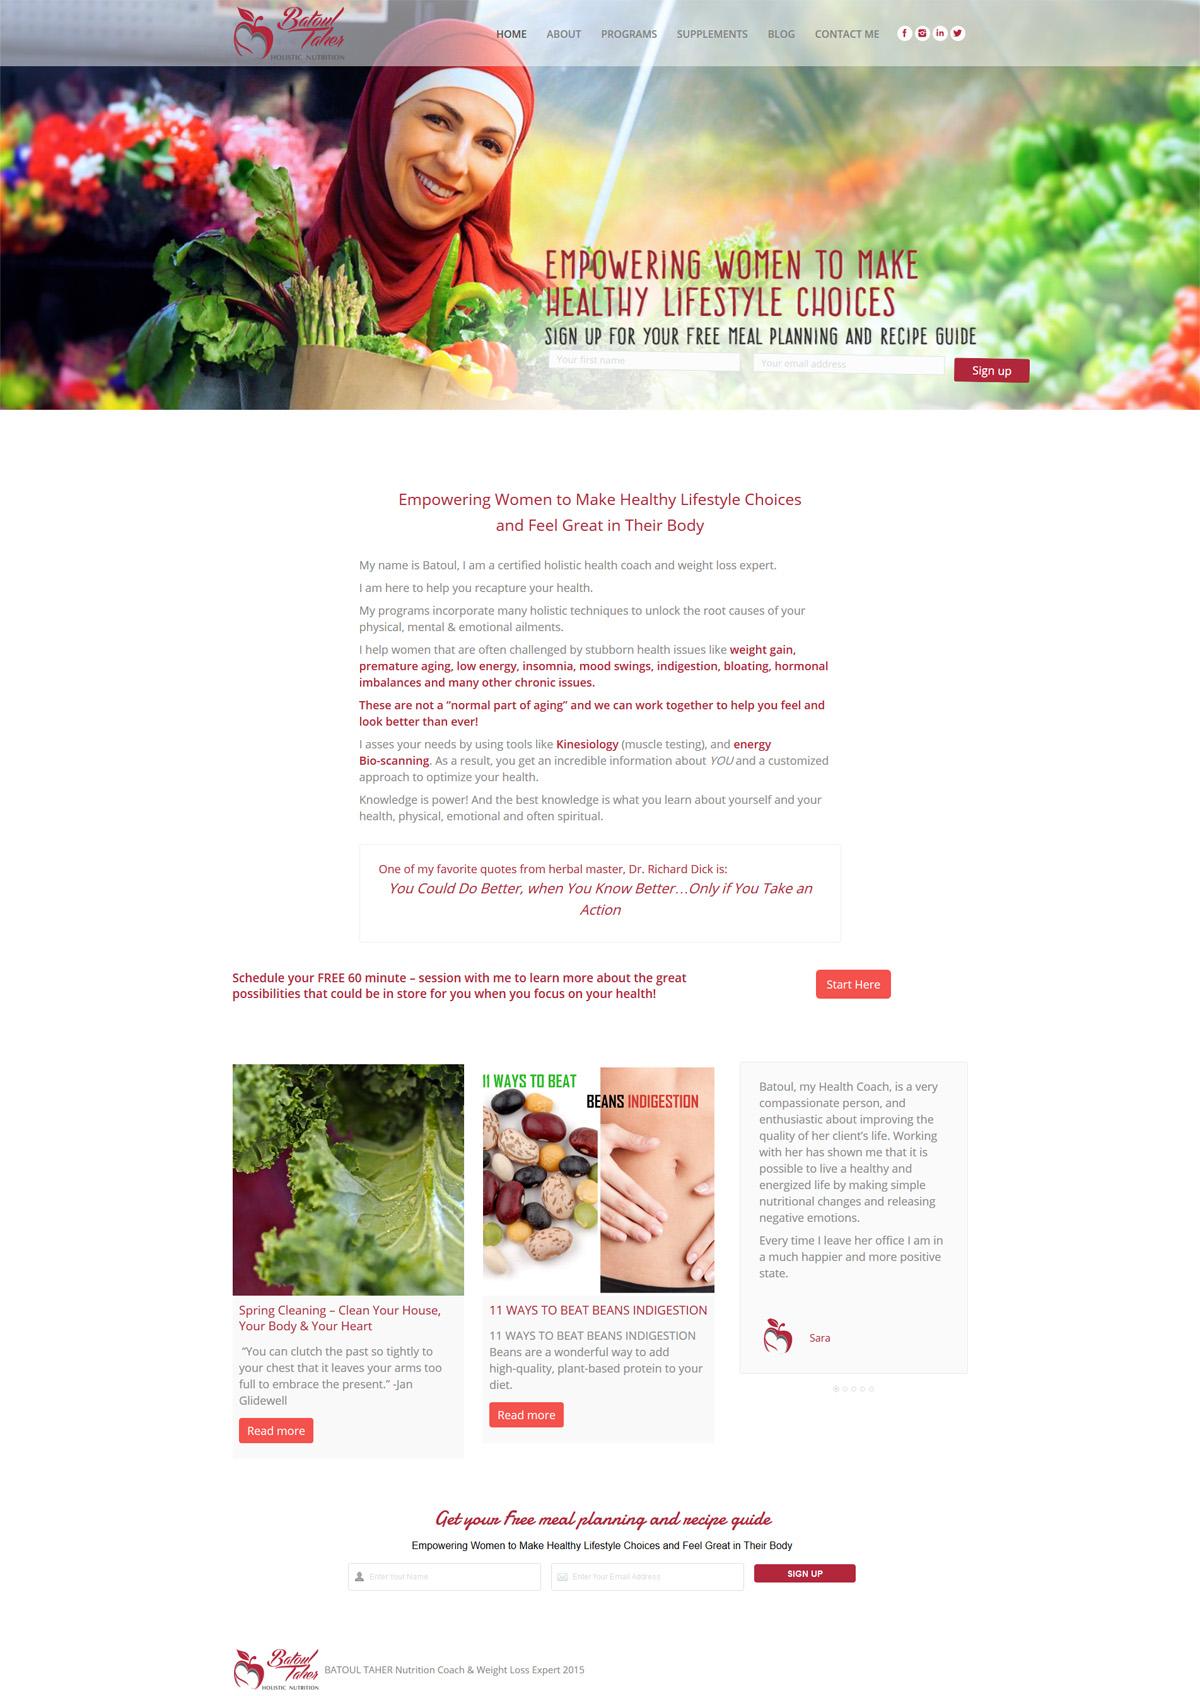 Batoul Taher Holistic Nutrition